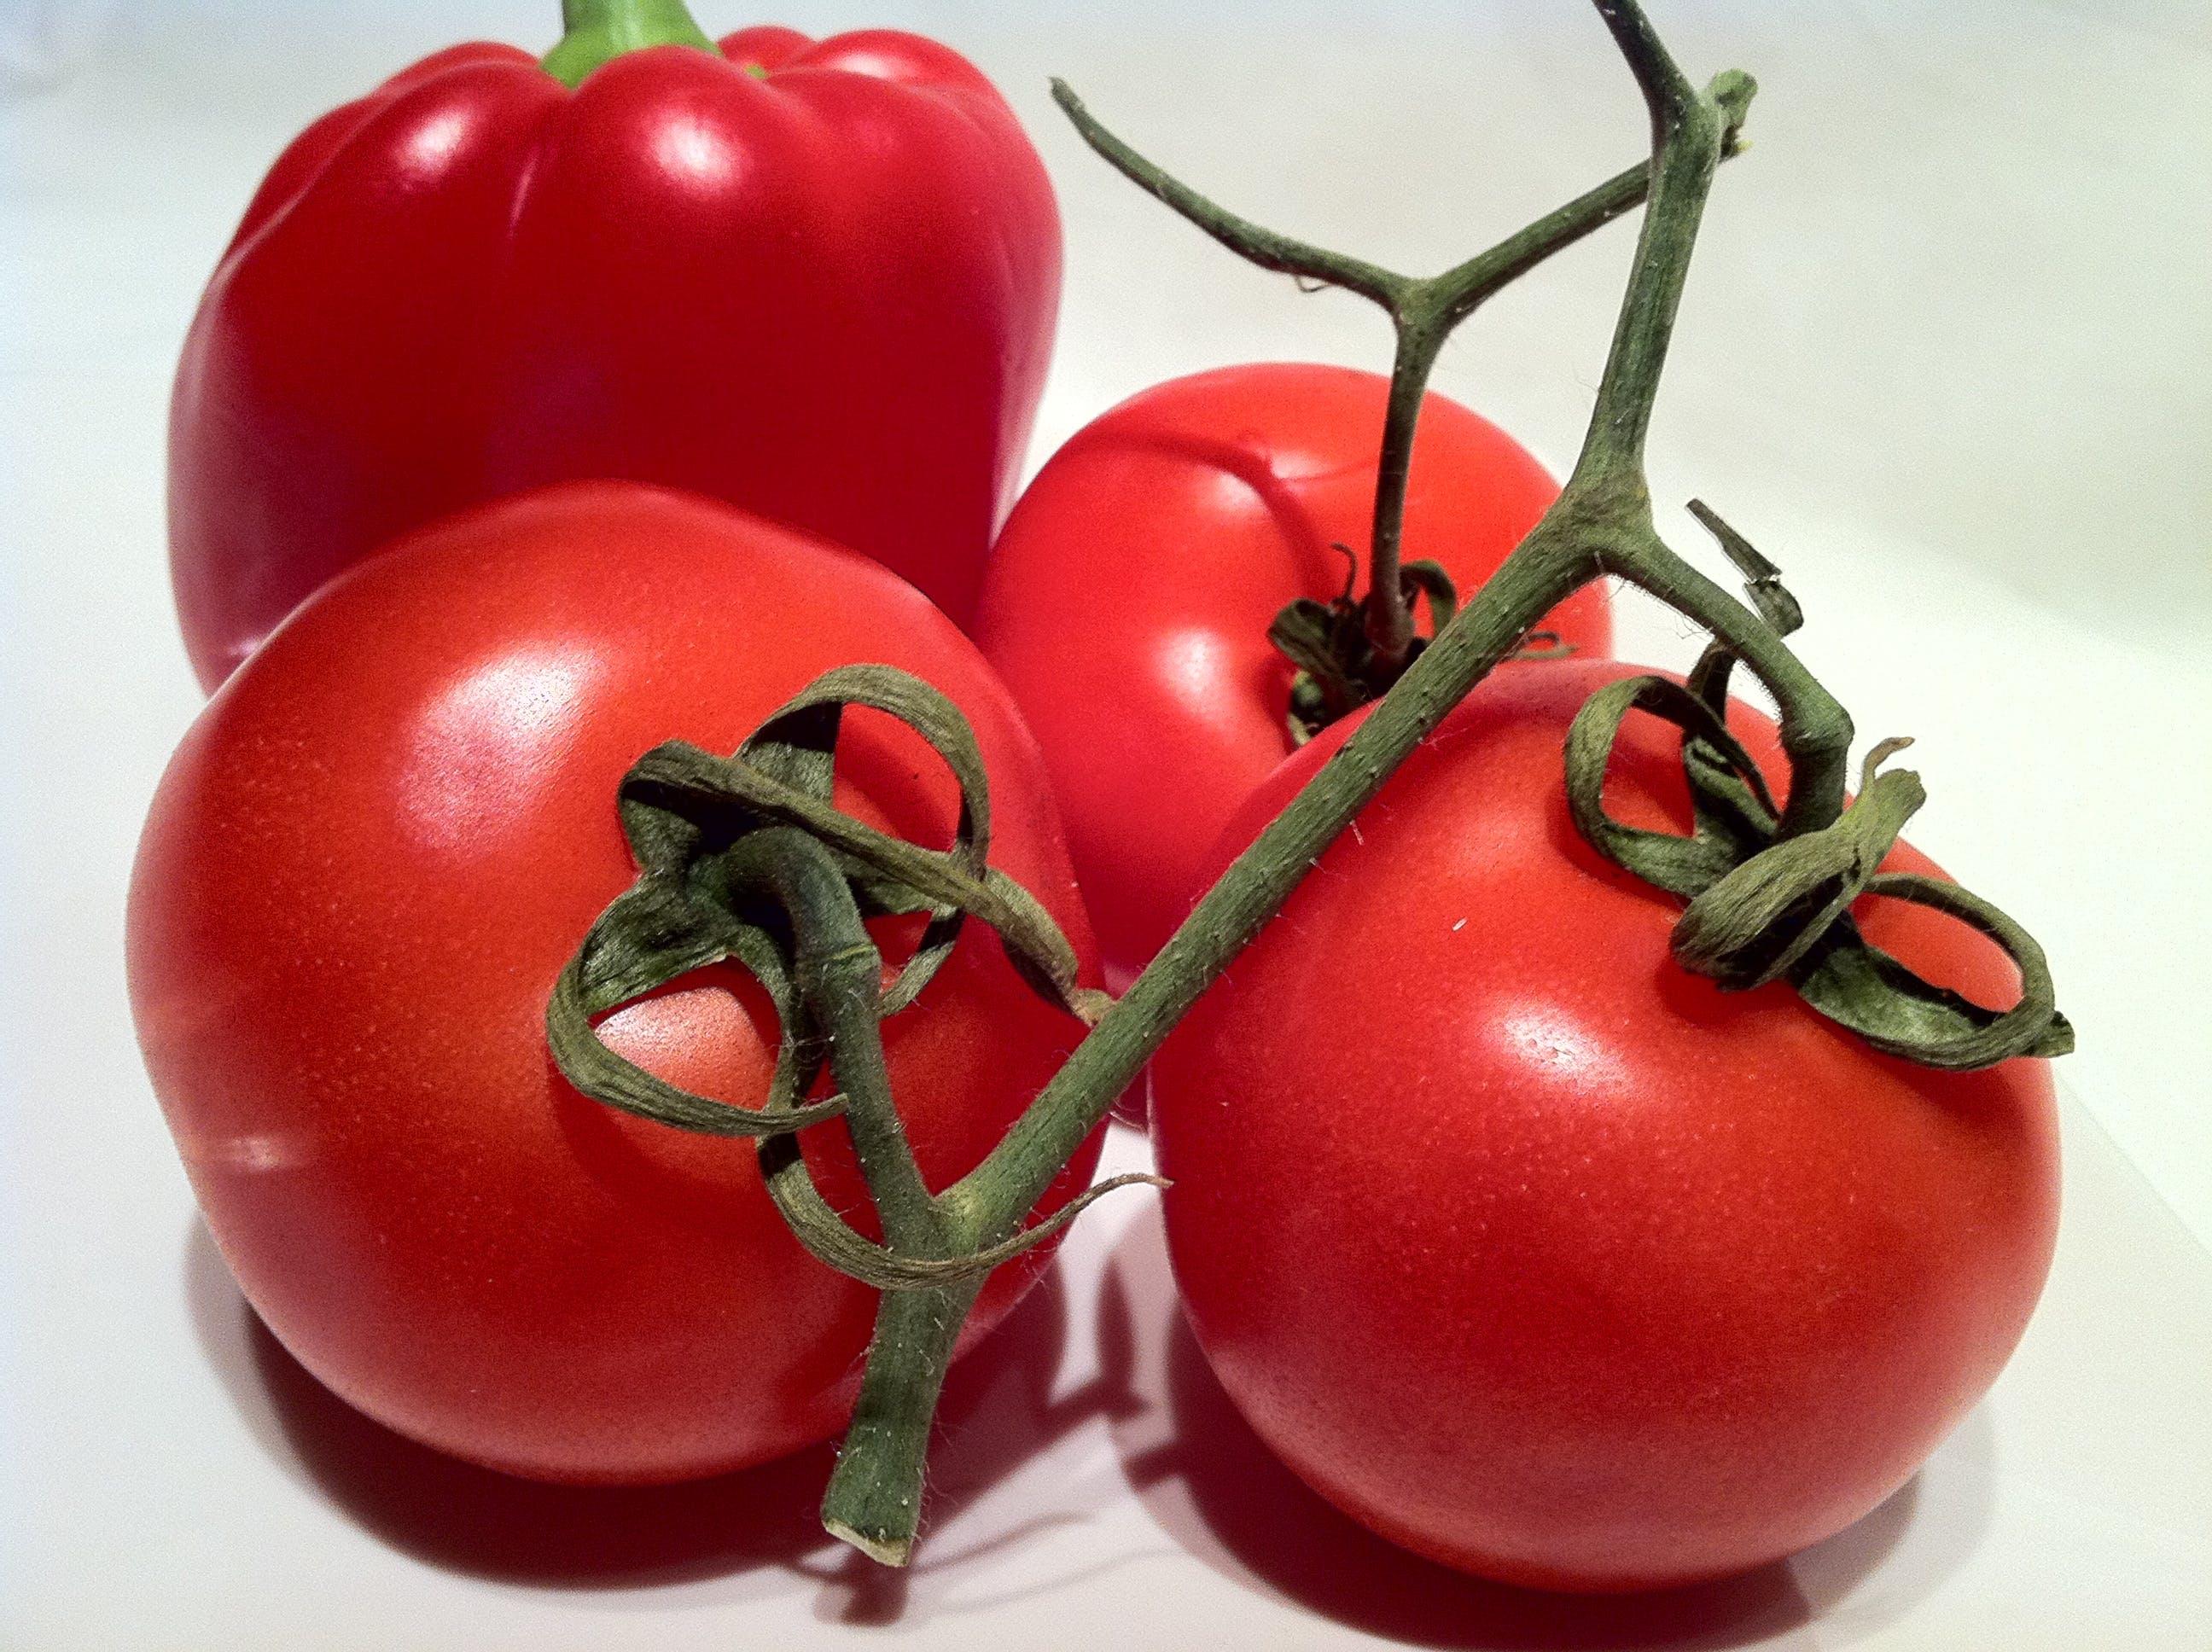 Free stock photo of tomatoes